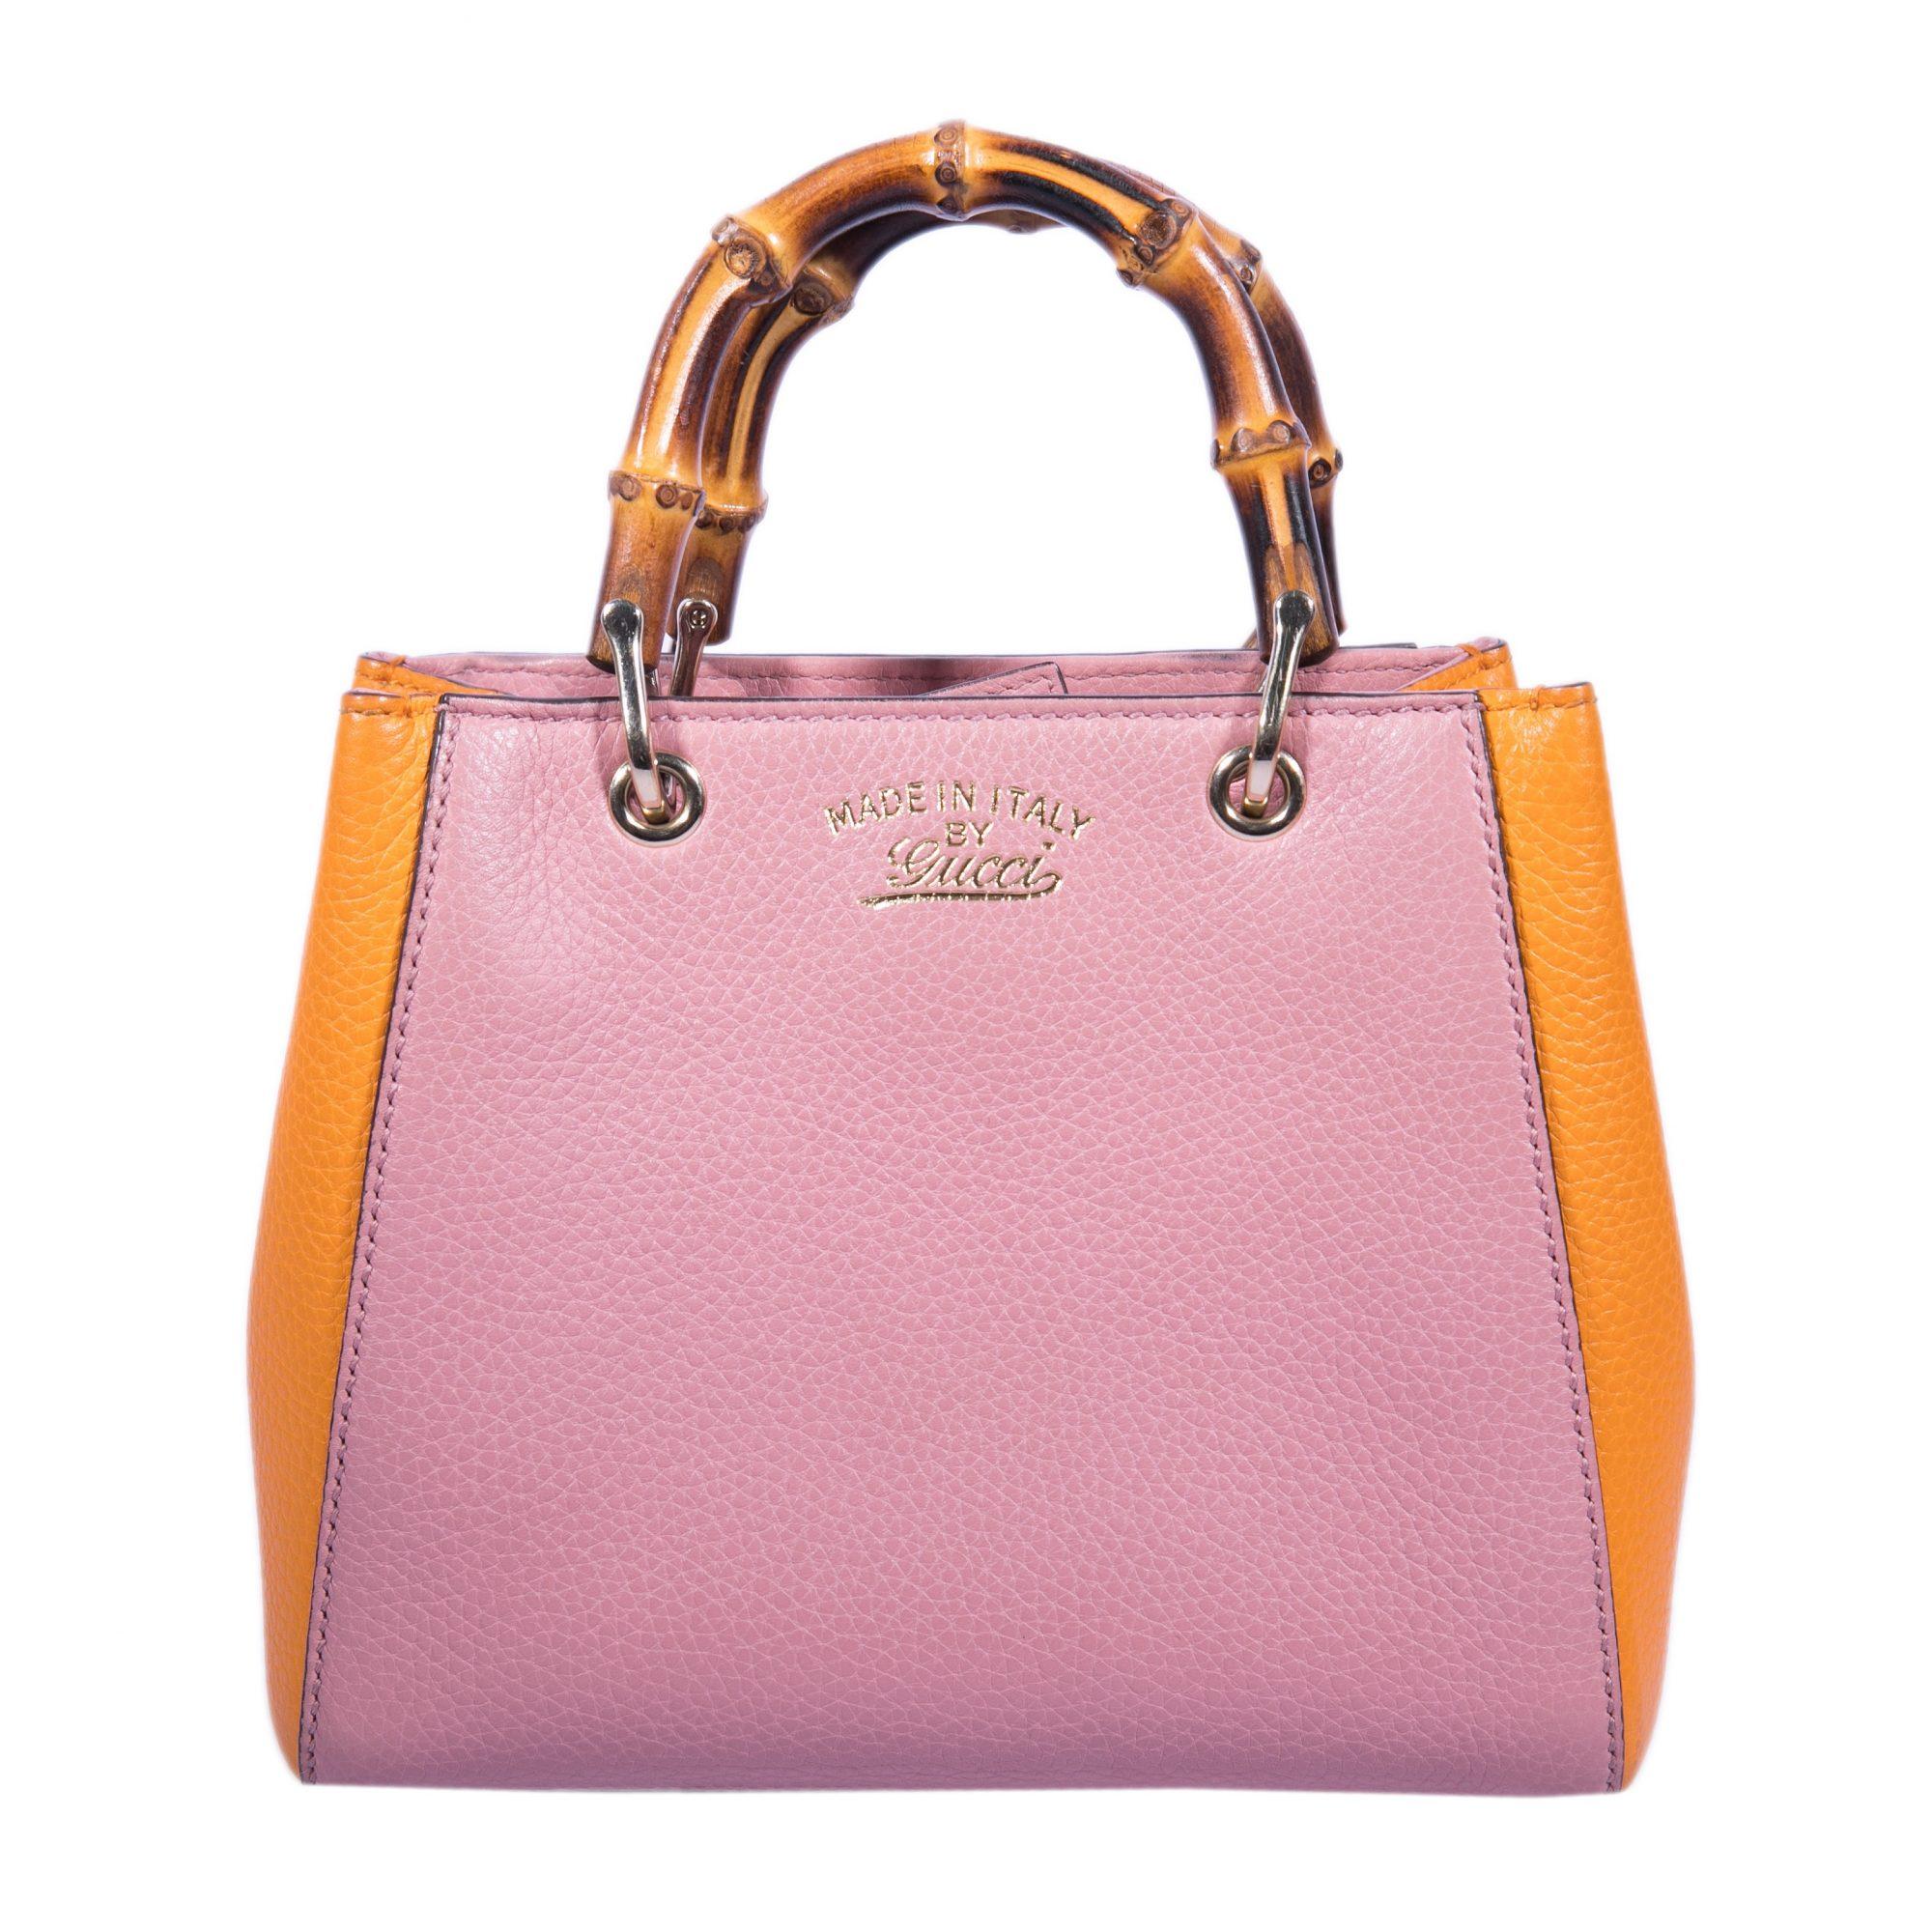 80b01e10398a My-Luxury-bargain-GUCCI-PINK-ORANGE-MINI-BAMBOO-SHOPPER-TOTE-1-2000x2000.jpg